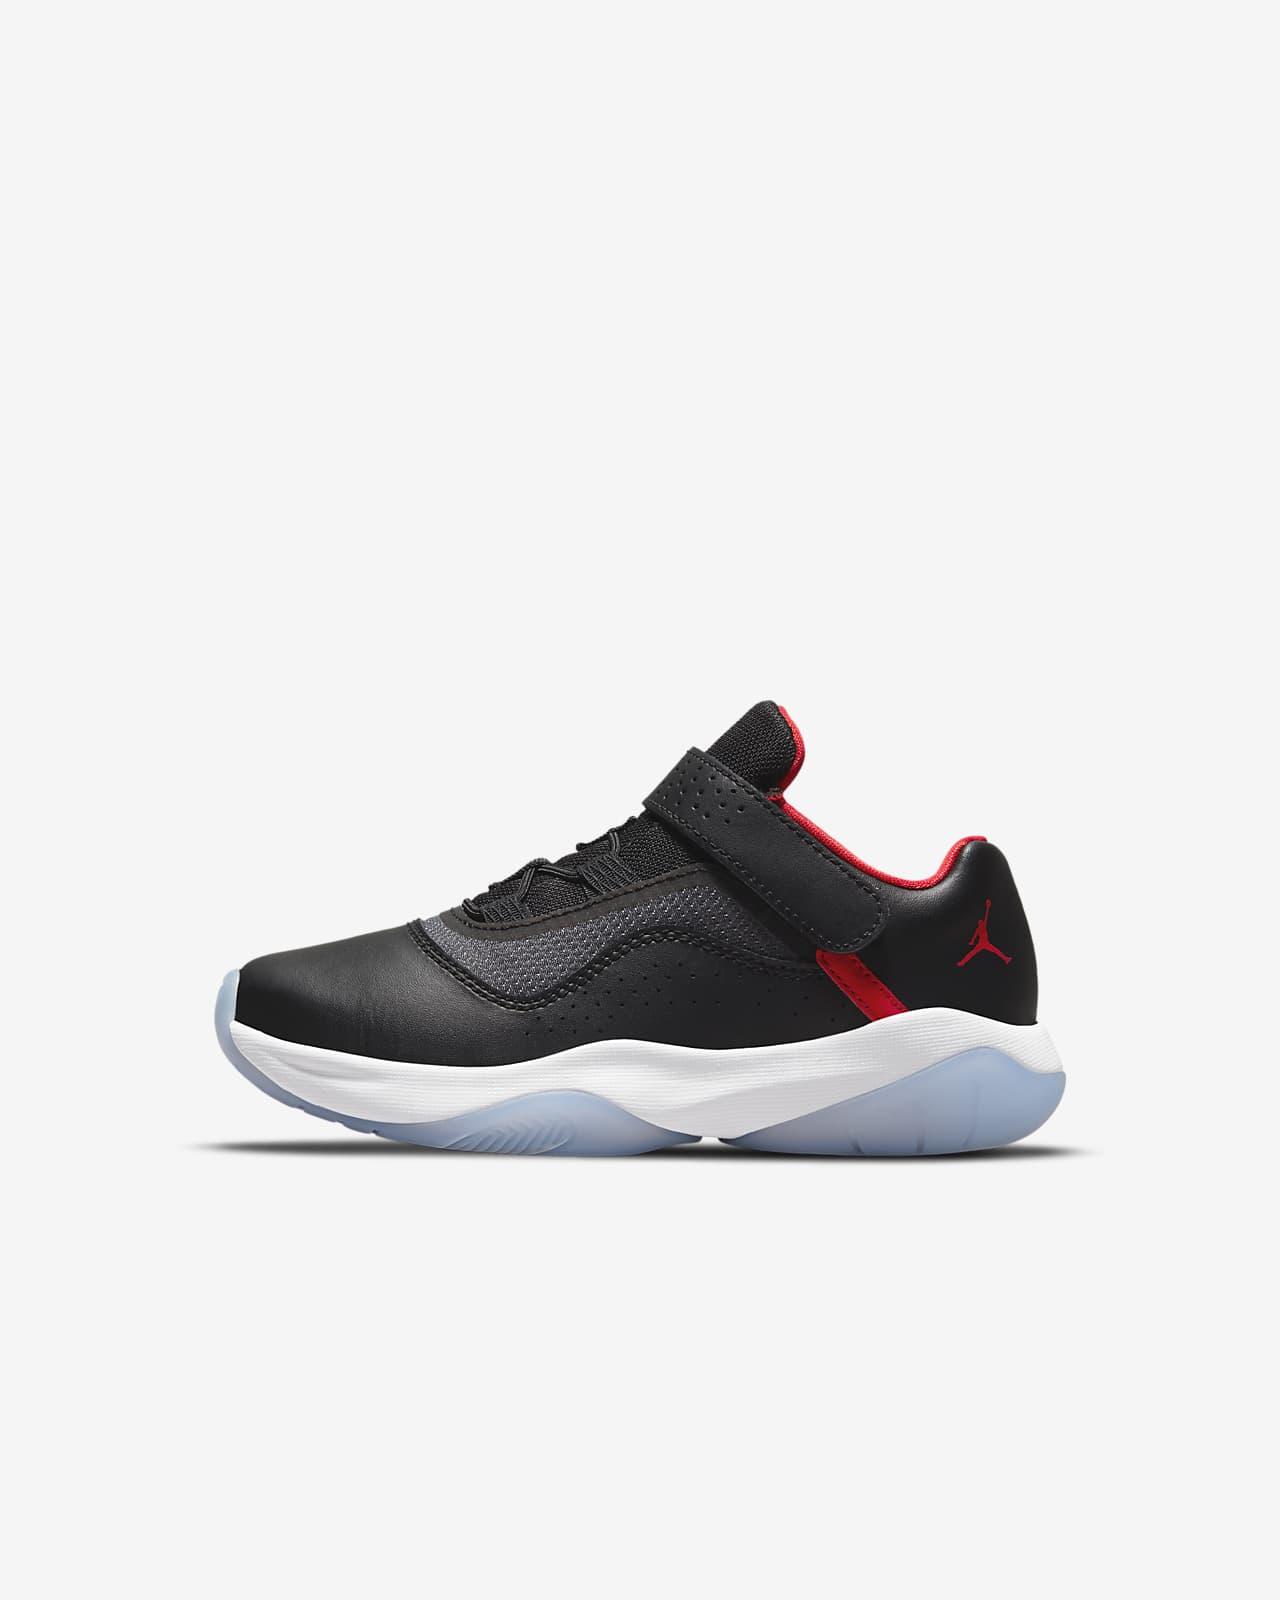 Jordan 11 CMFT Low Younger Kids' Shoe